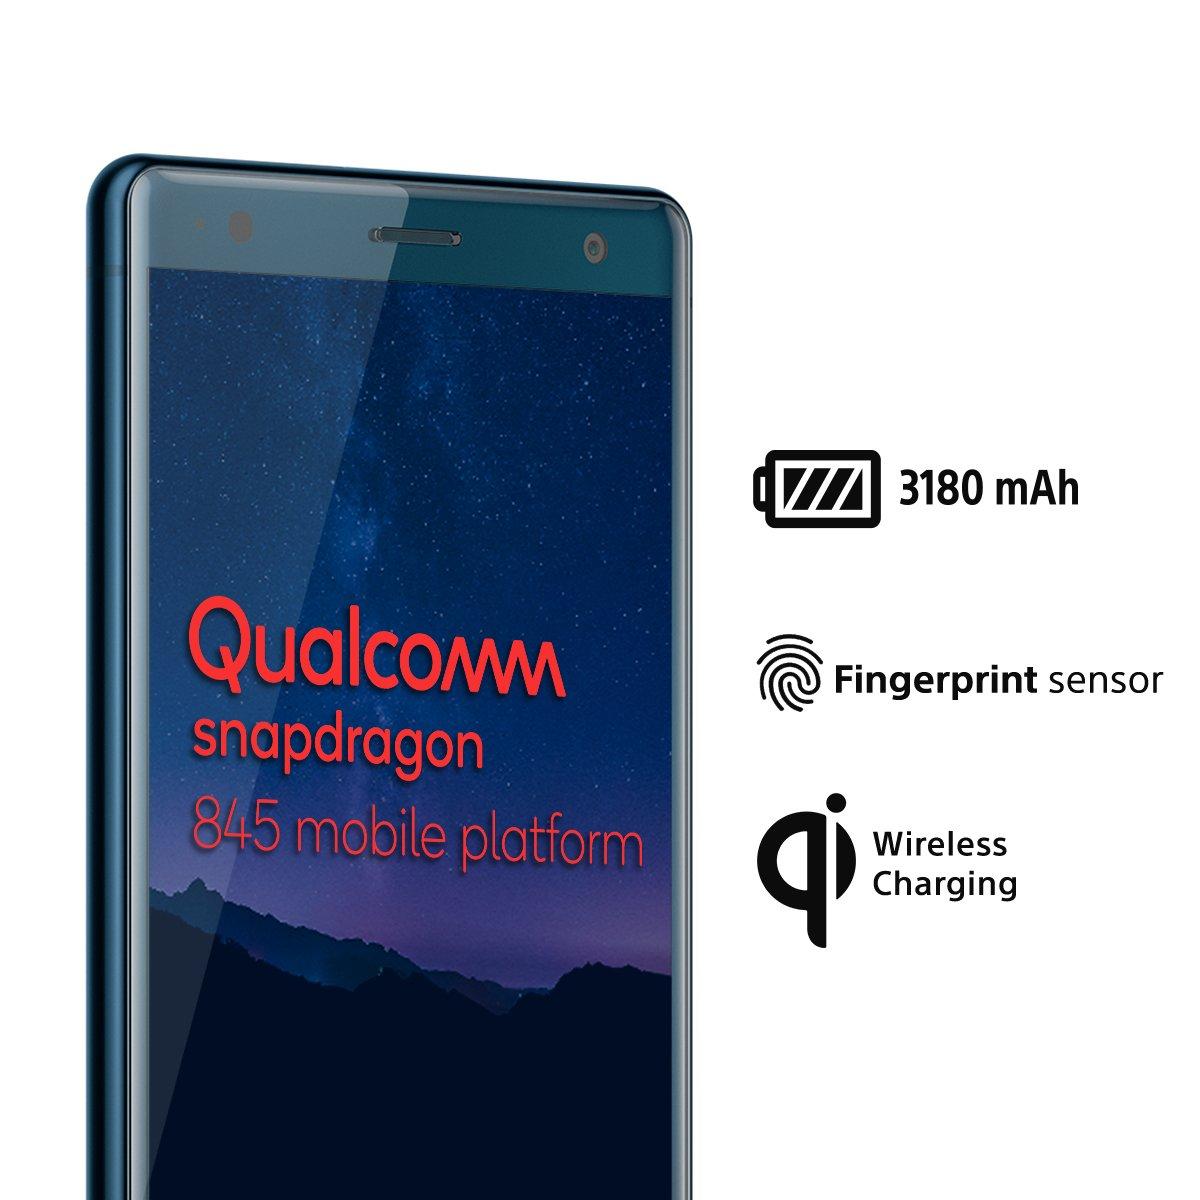 55349679a Smartphone Sony xperia xz2 8216 64gb 5.7